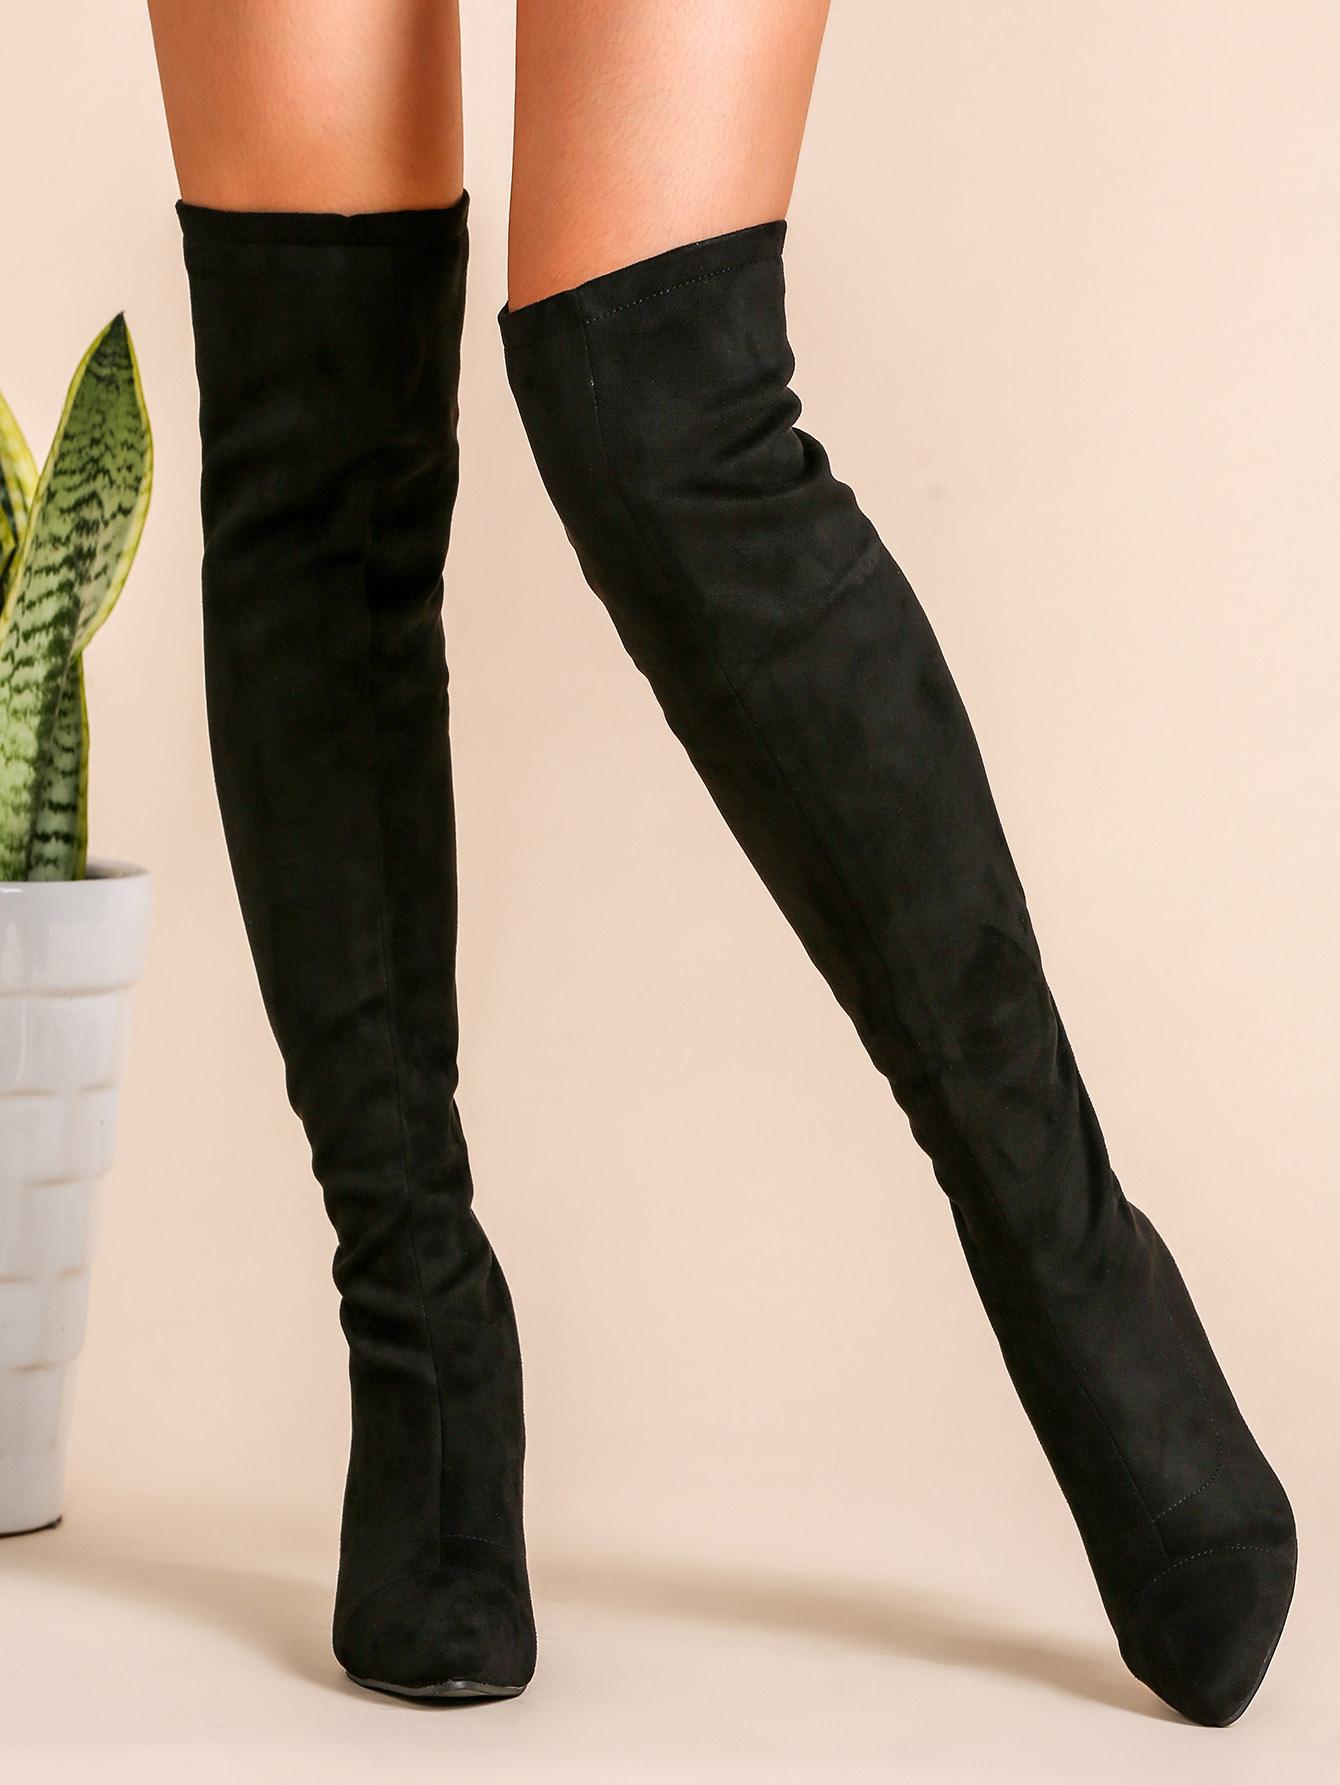 44ff779ca3 Black Faux Suede Point Toe Thigh High Boots -SheIn(Sheinside)